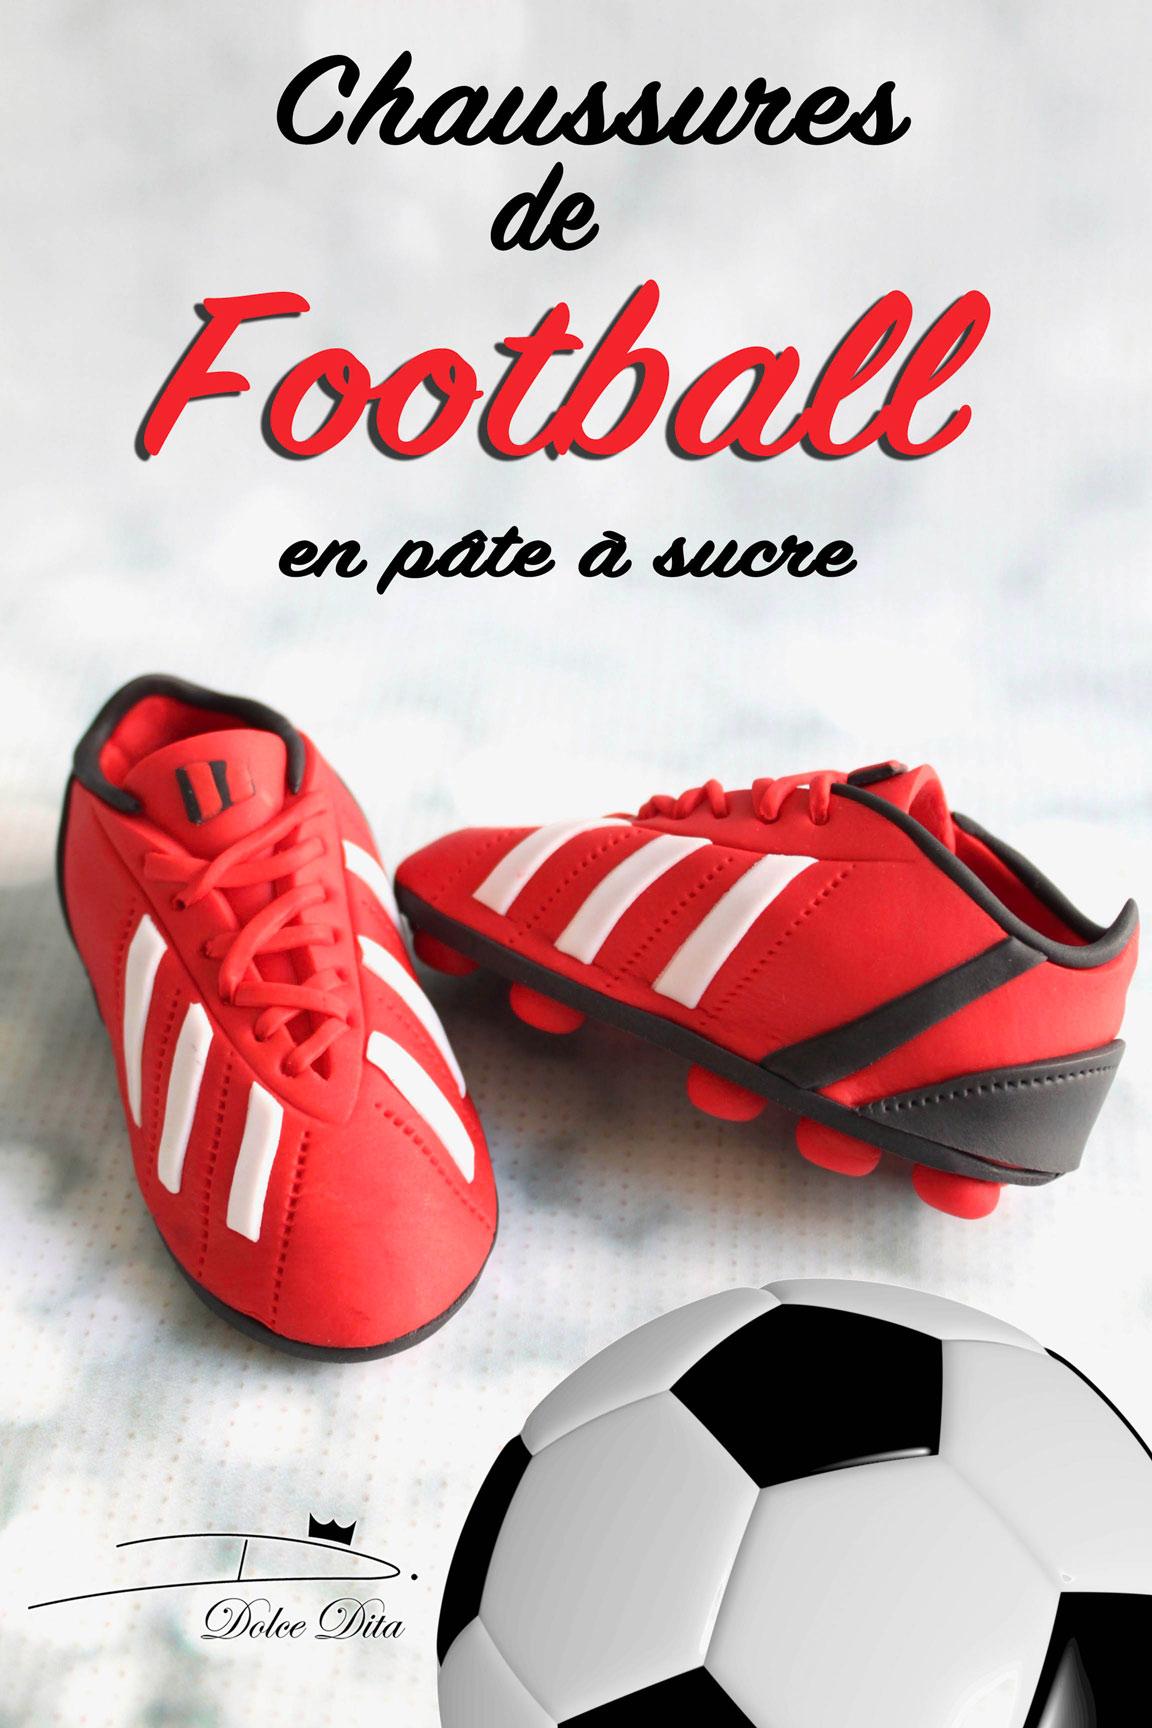 Modelage Chaussures de Football